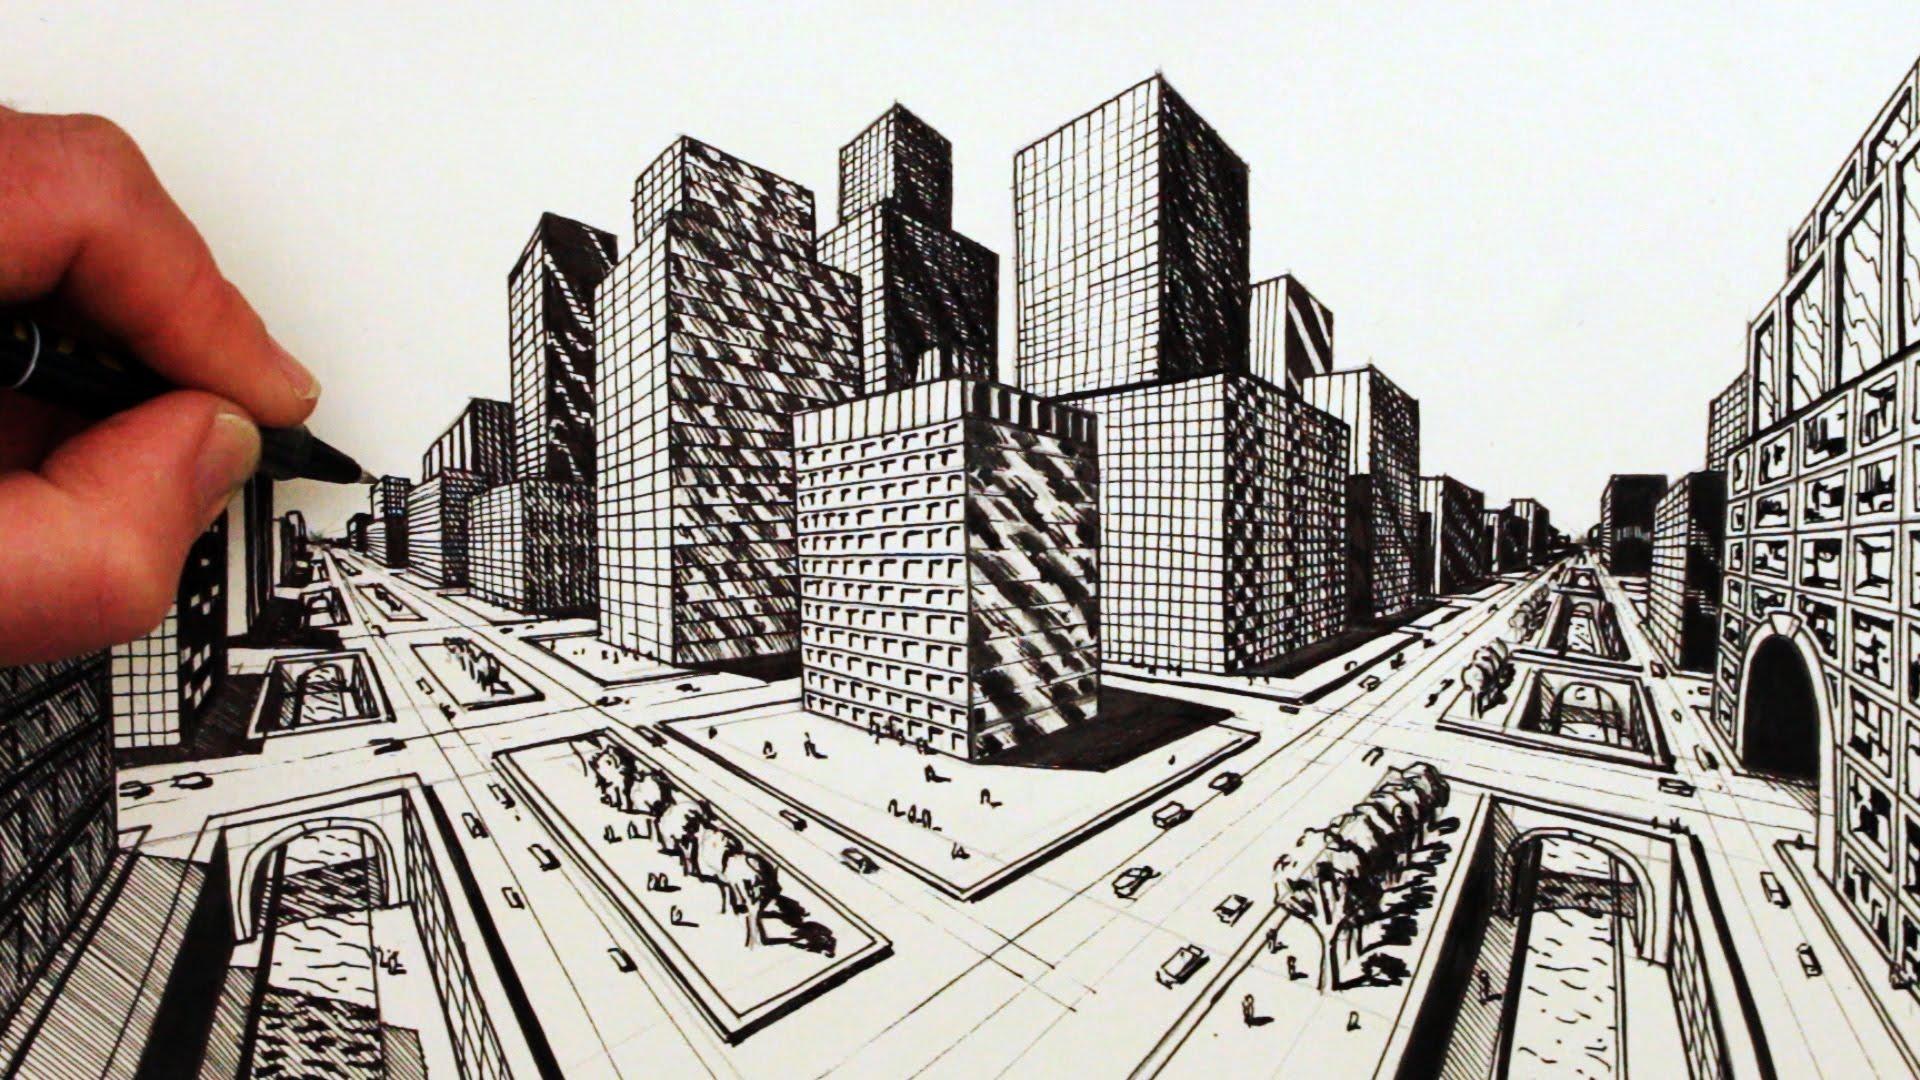 Perspective Buildings Drawing at GetDrawings | Free download